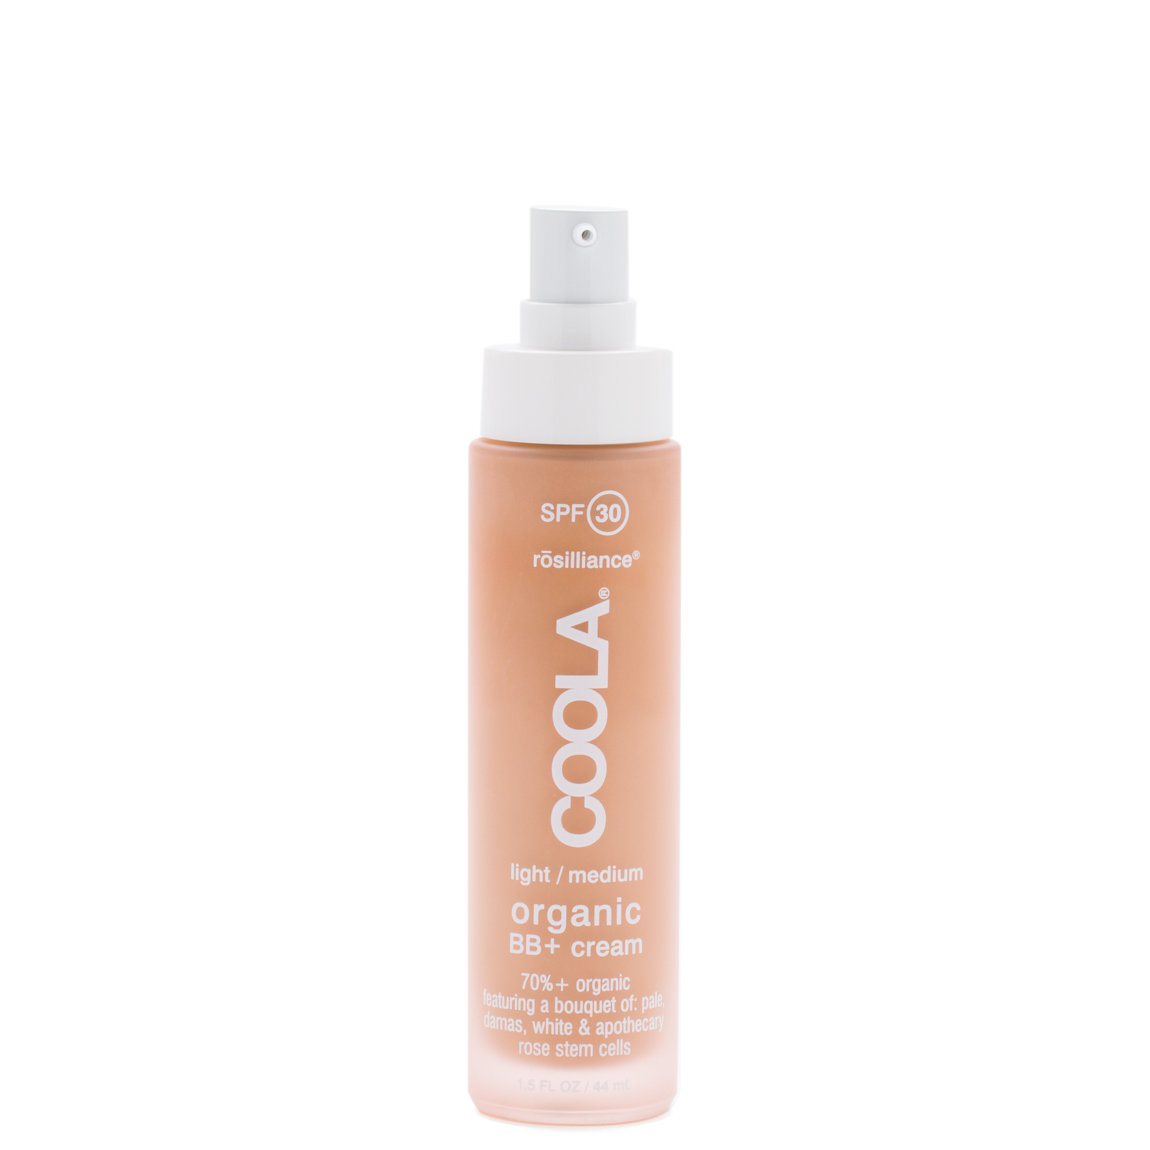 COOLA Rōsilliance Organic BB+ Cream SPF 30 Light/Medium